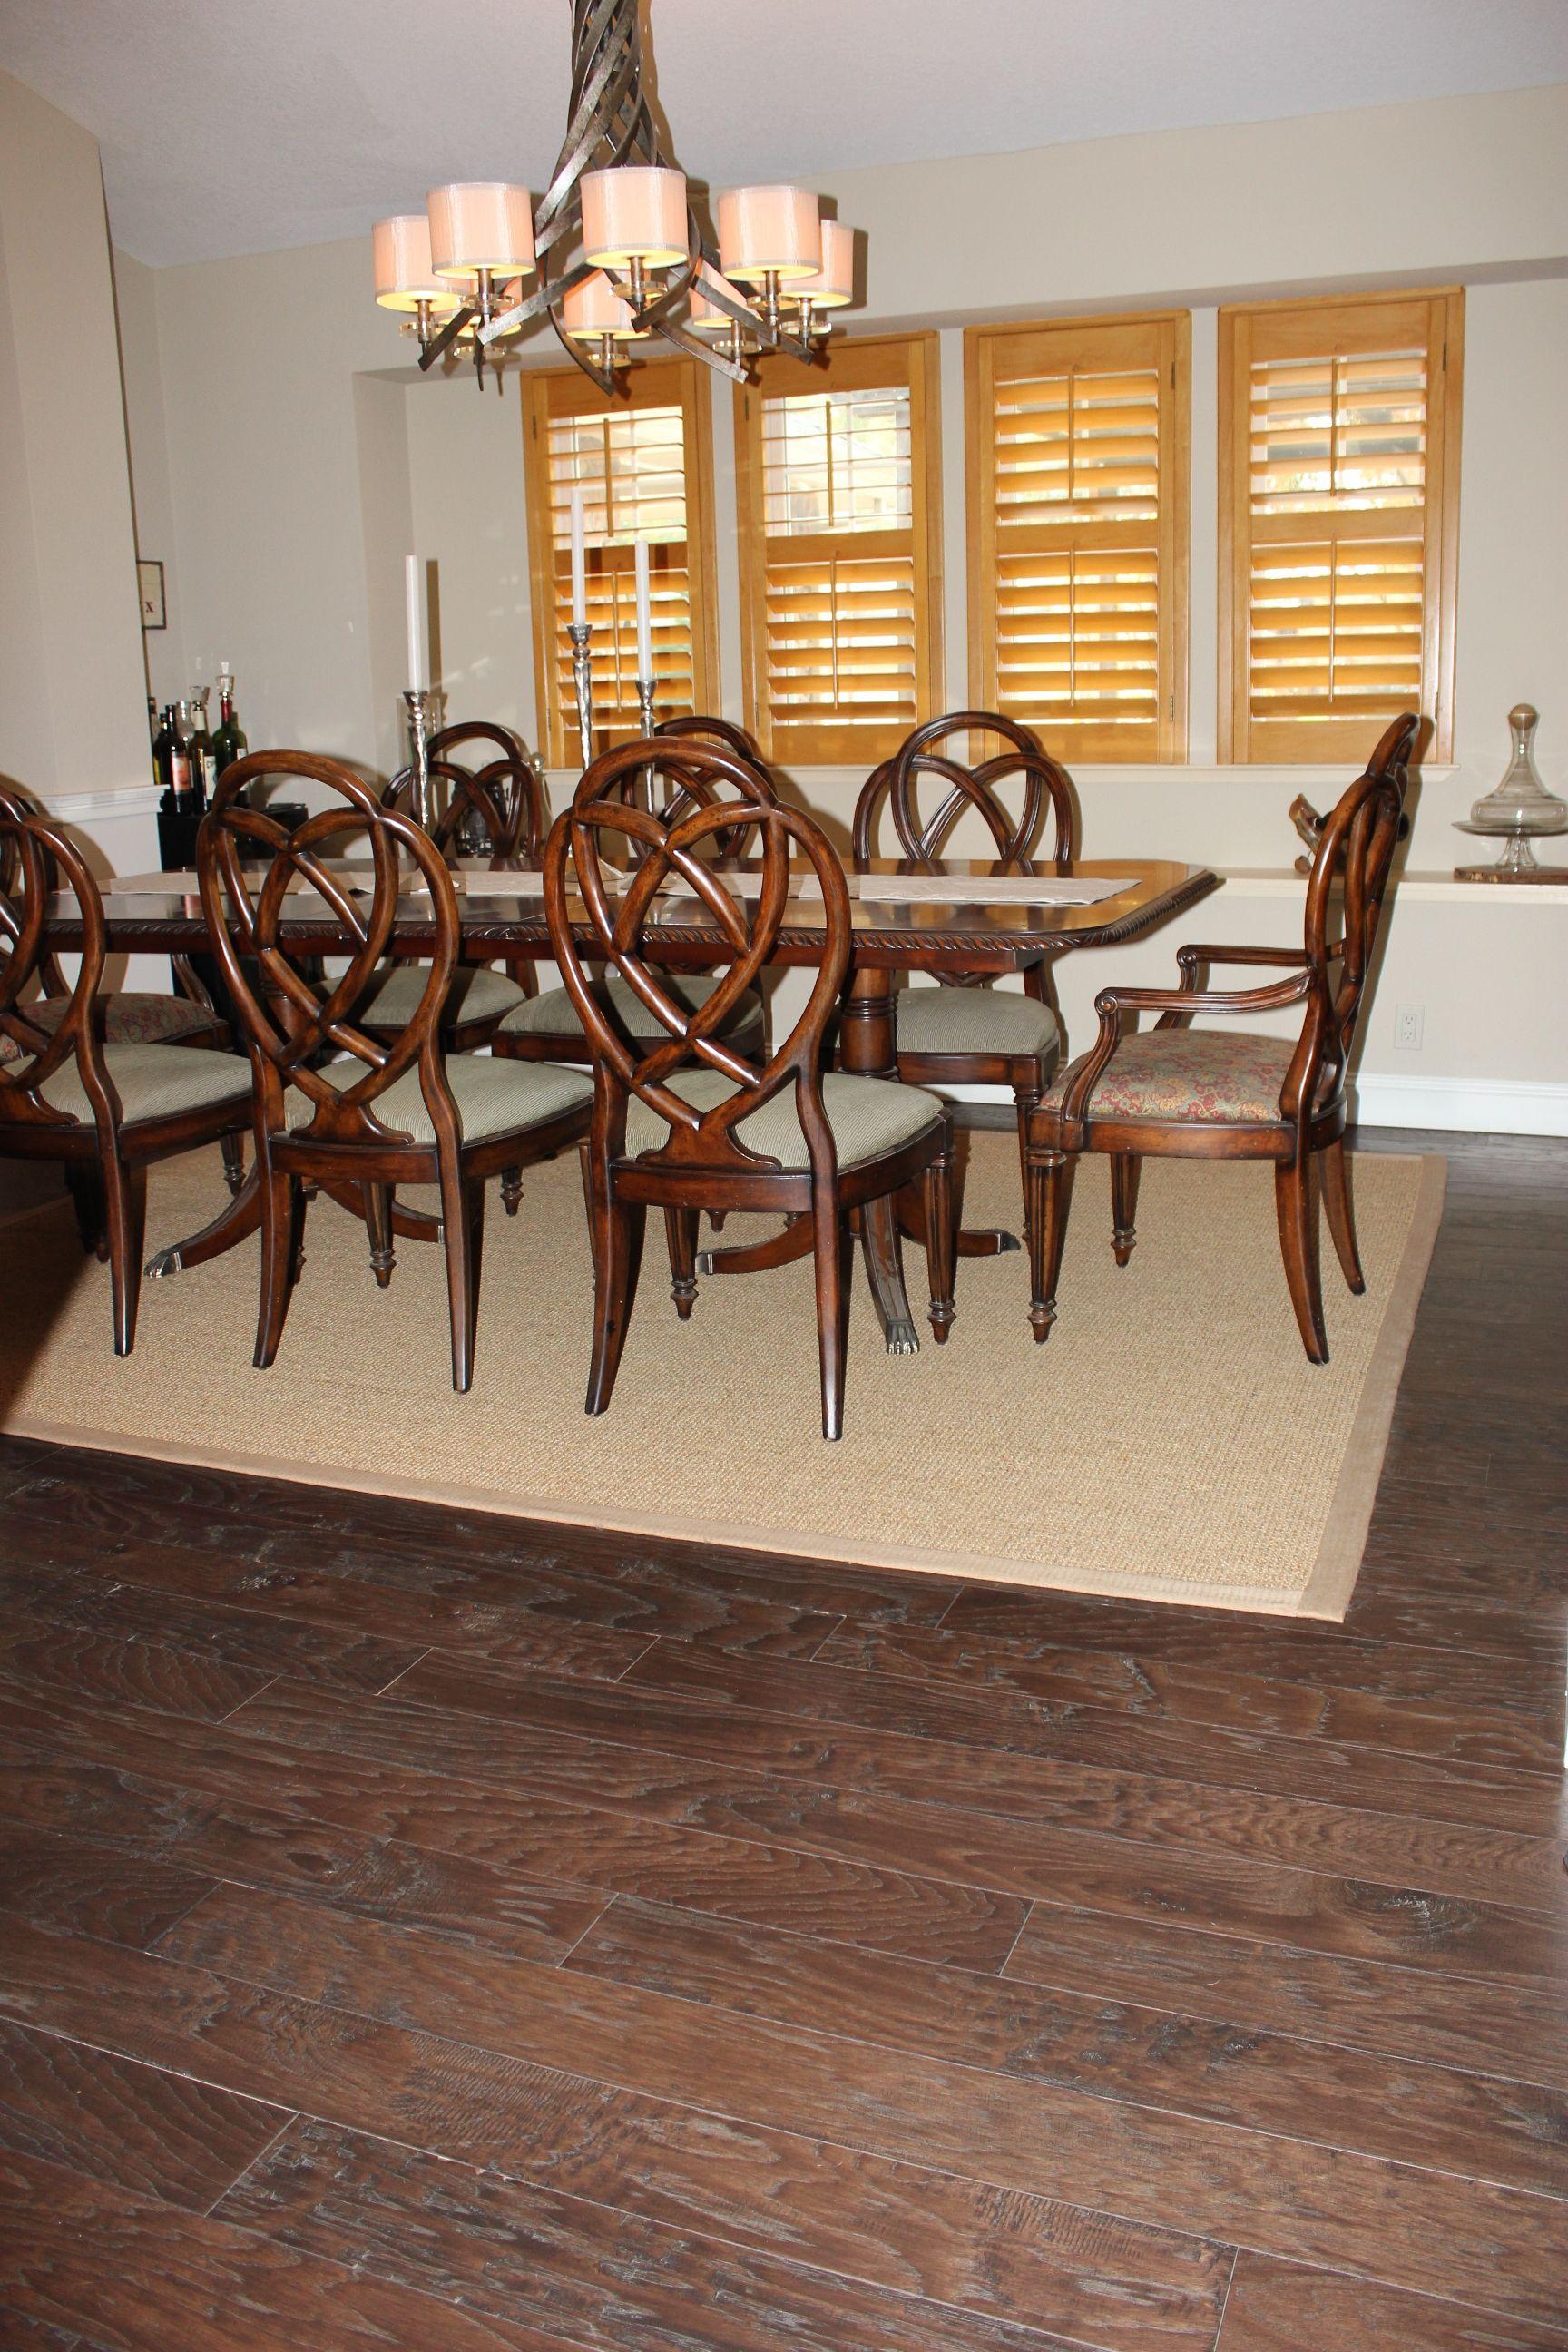 Shaw Nottoway Hickory Hardwood, Color: Weathered Saddle installed by ...